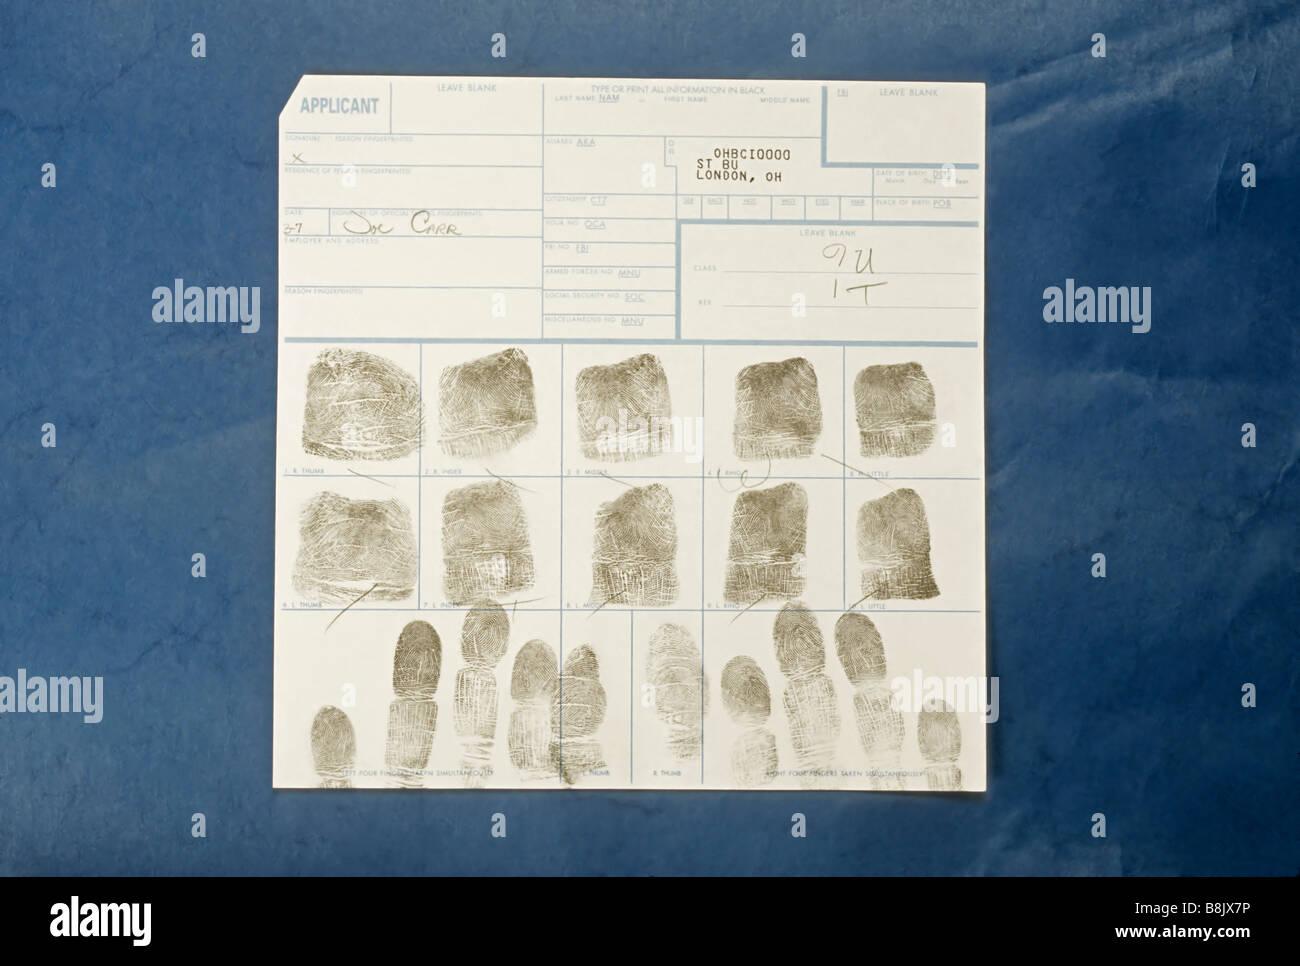 Fingerprints from police blotter, crime, criminal justice, London, Ohio - Stock Image